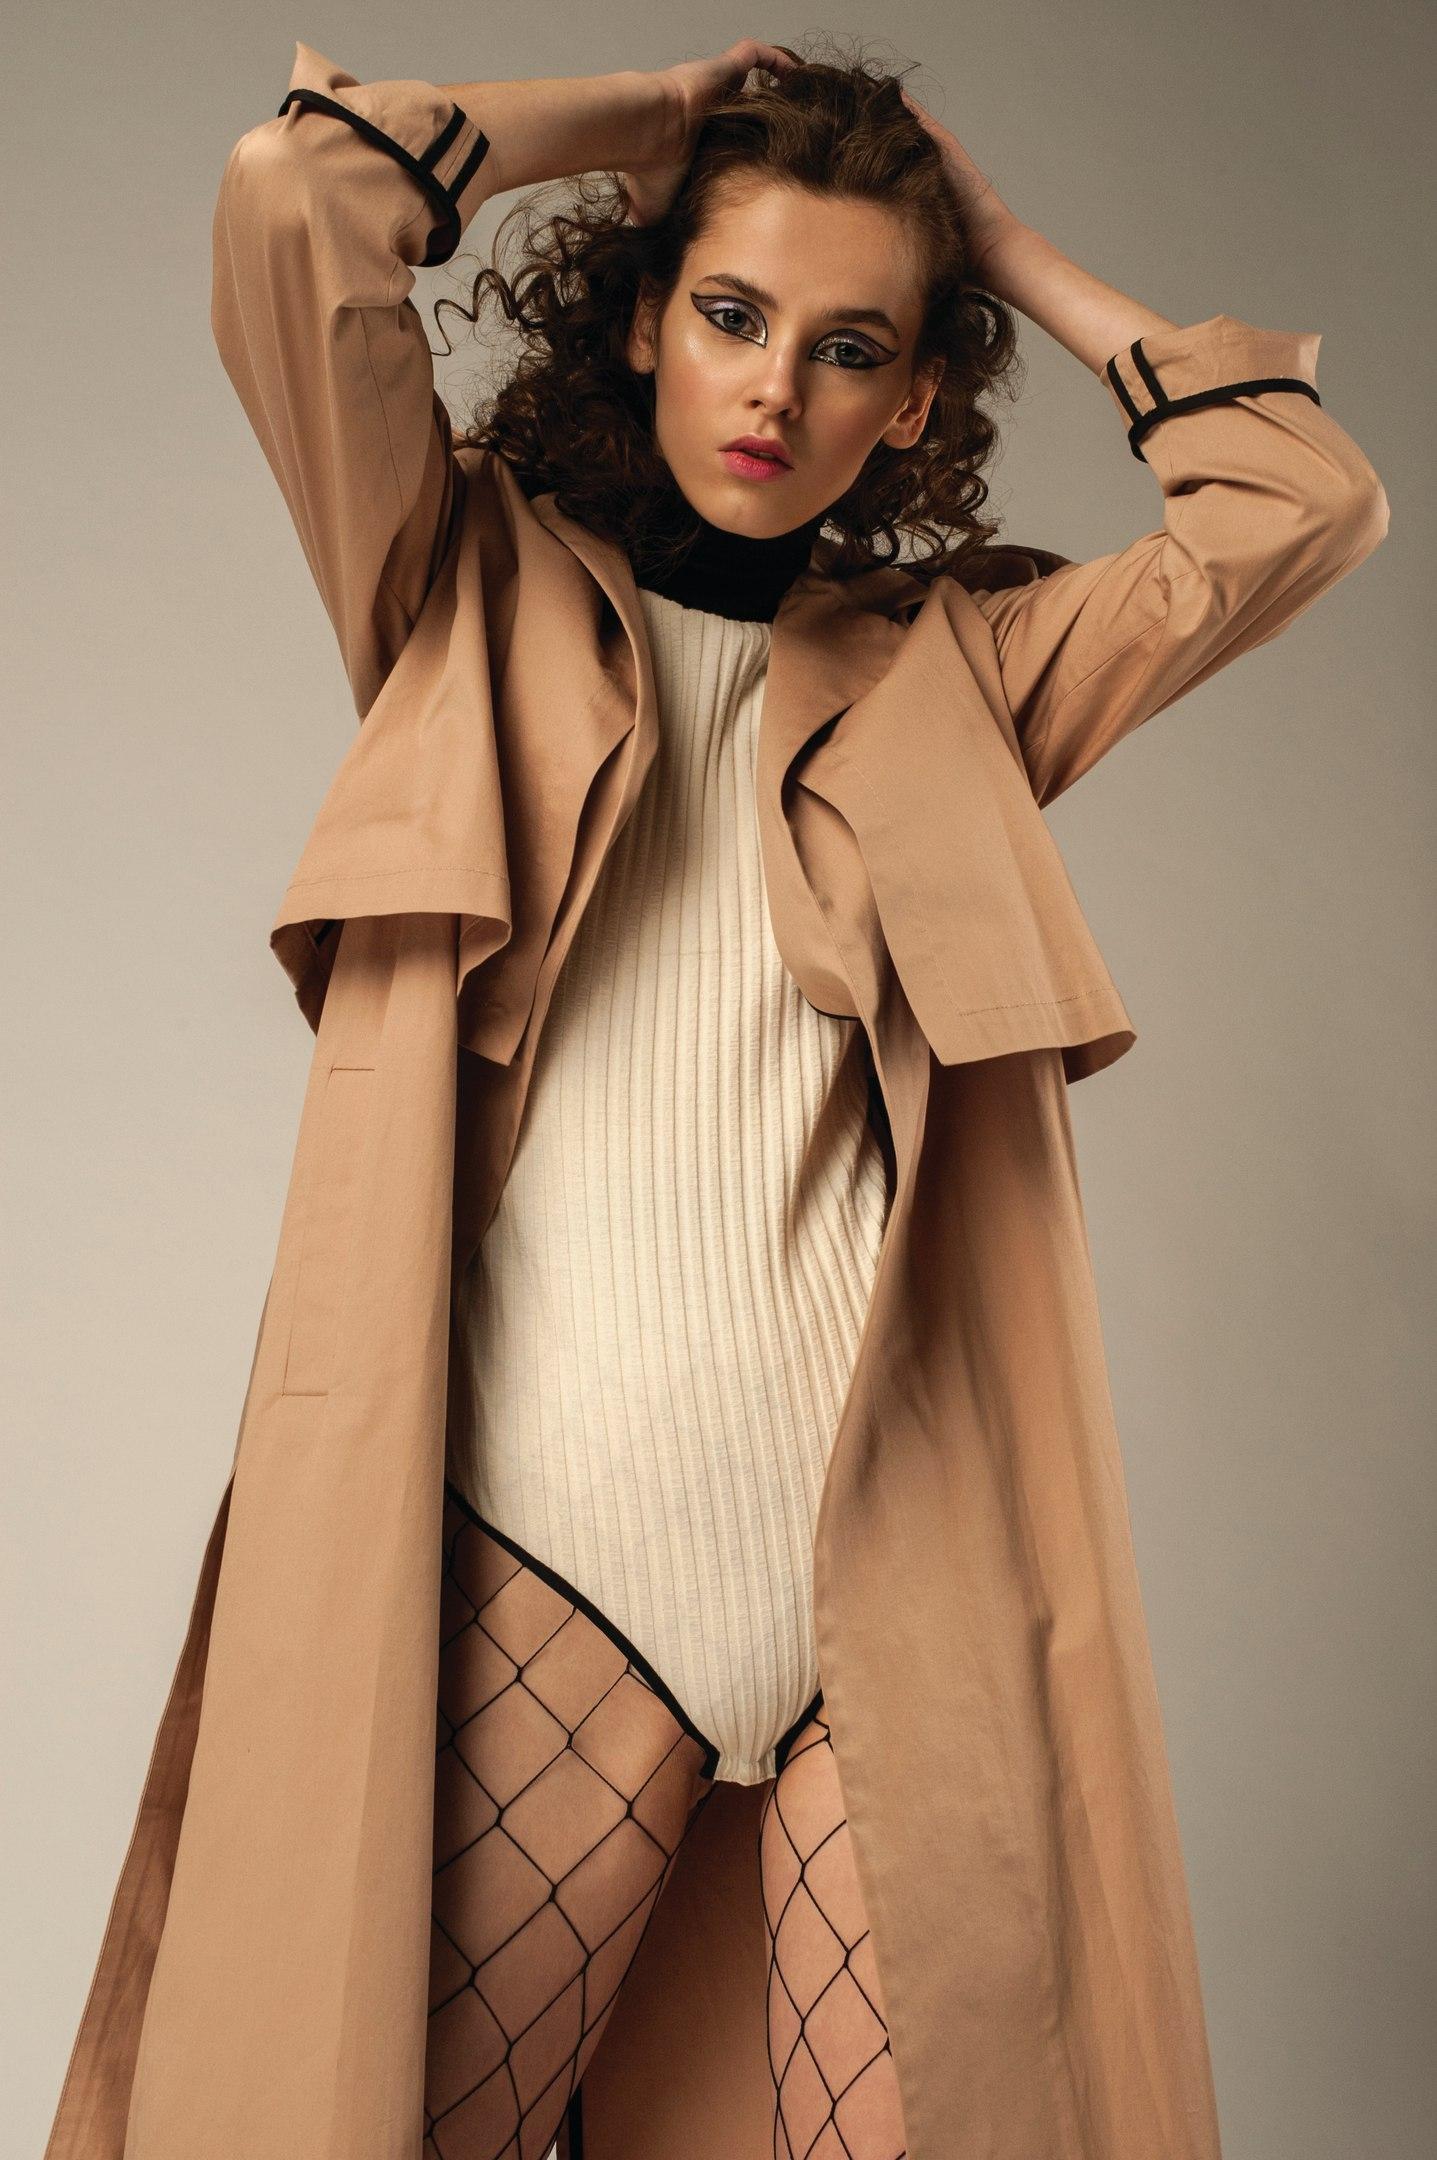 Photography Ania Brudna fashion - fashionphotography | ello